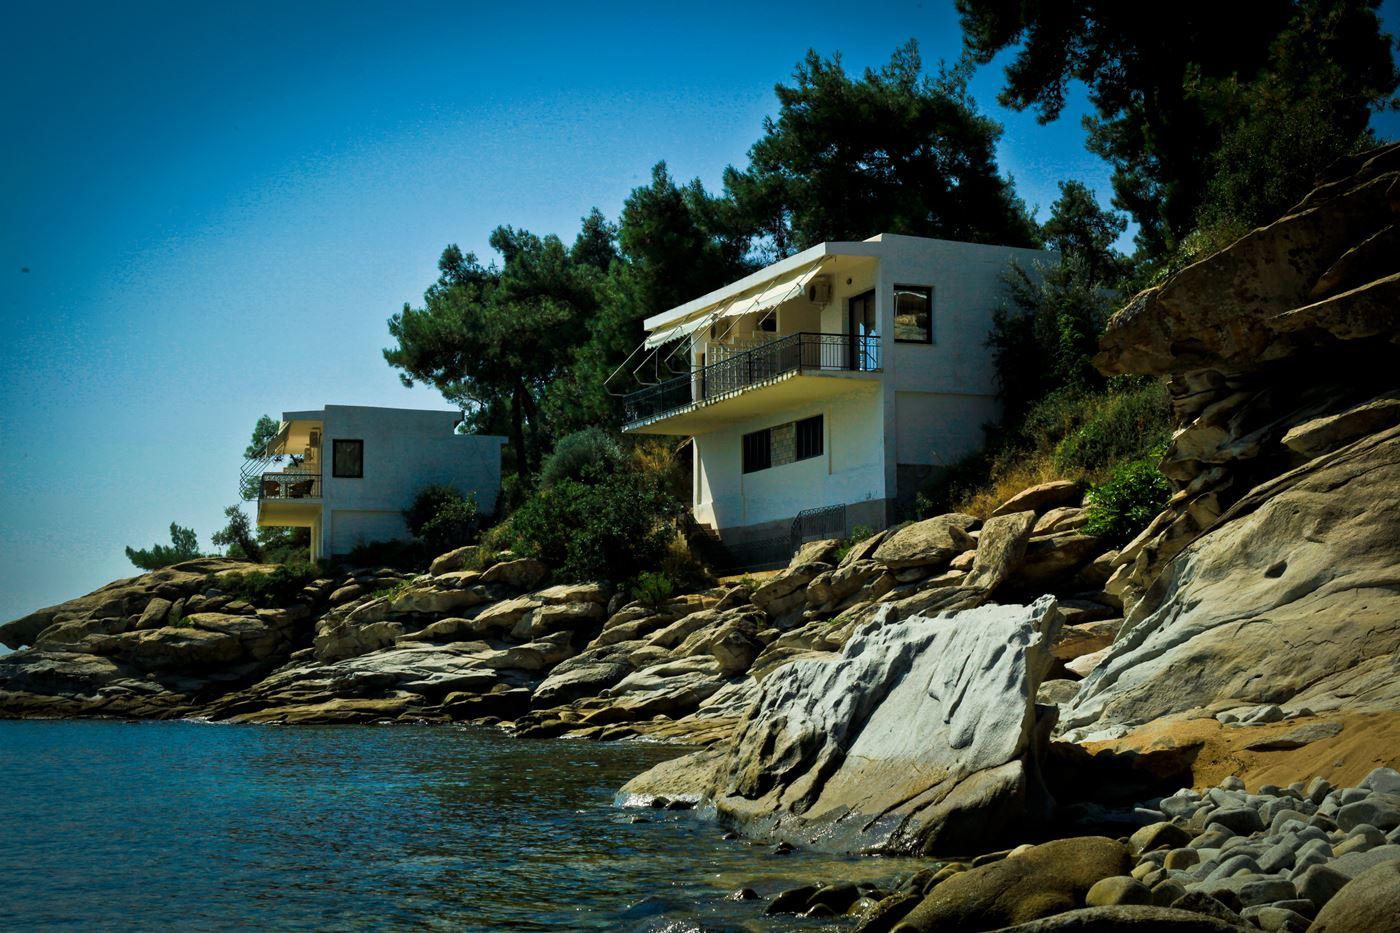 tosca bungalow ξενοδοχεια bungalows ελλαδα